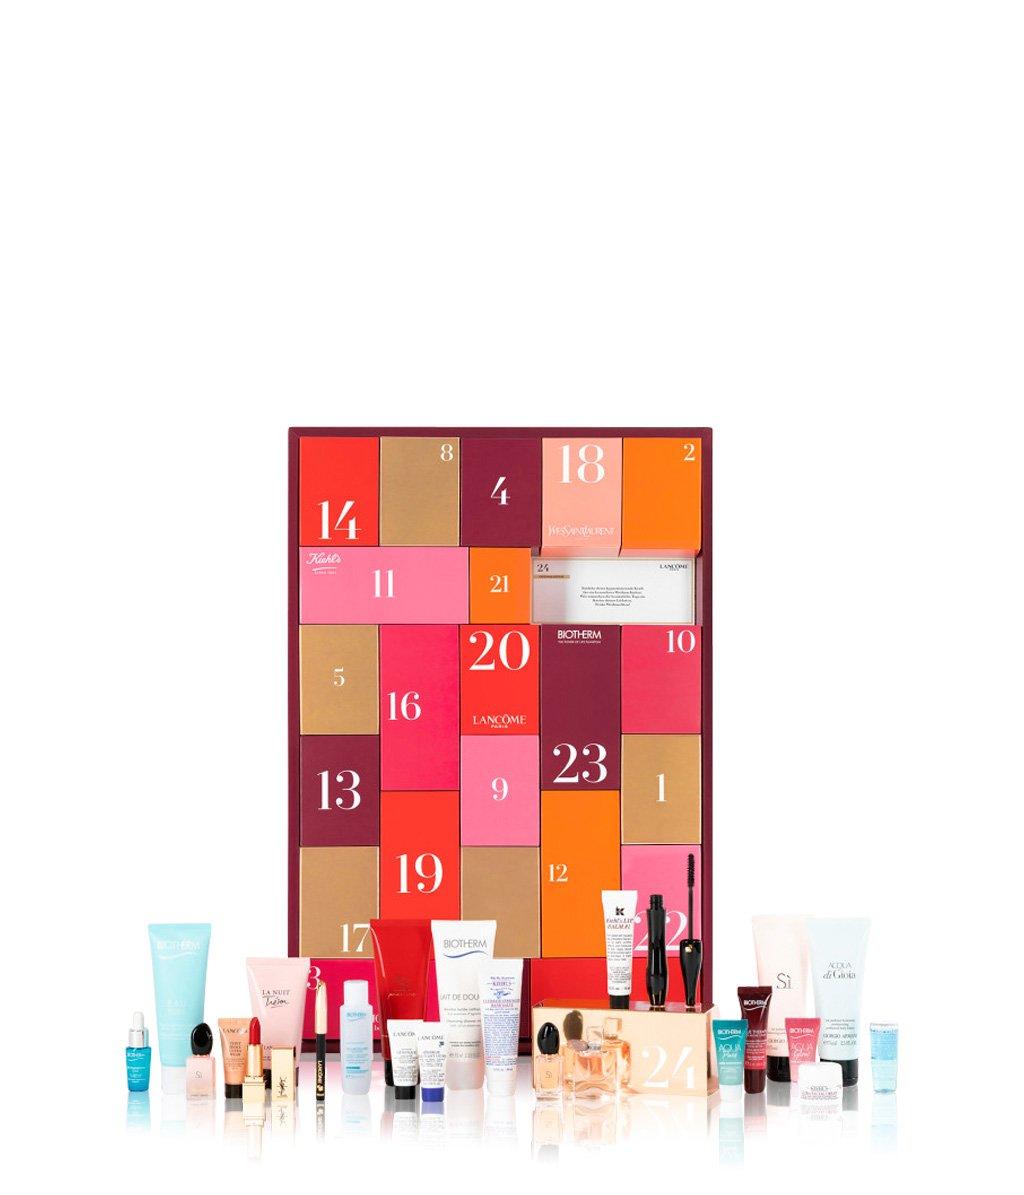 L'Oréal Luxus Adventskalender 2019 - Bild 3